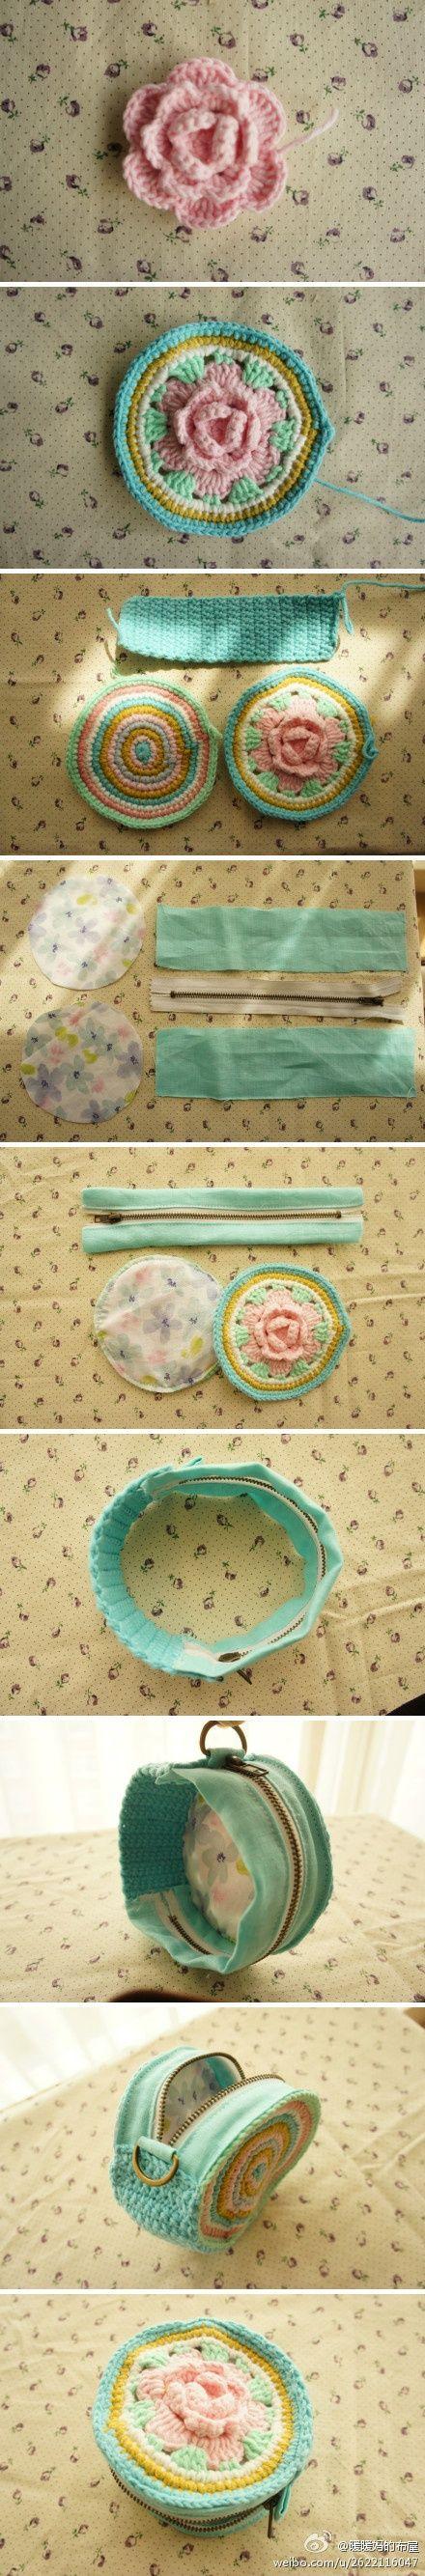 Sweet crochet rose purse tutorial.